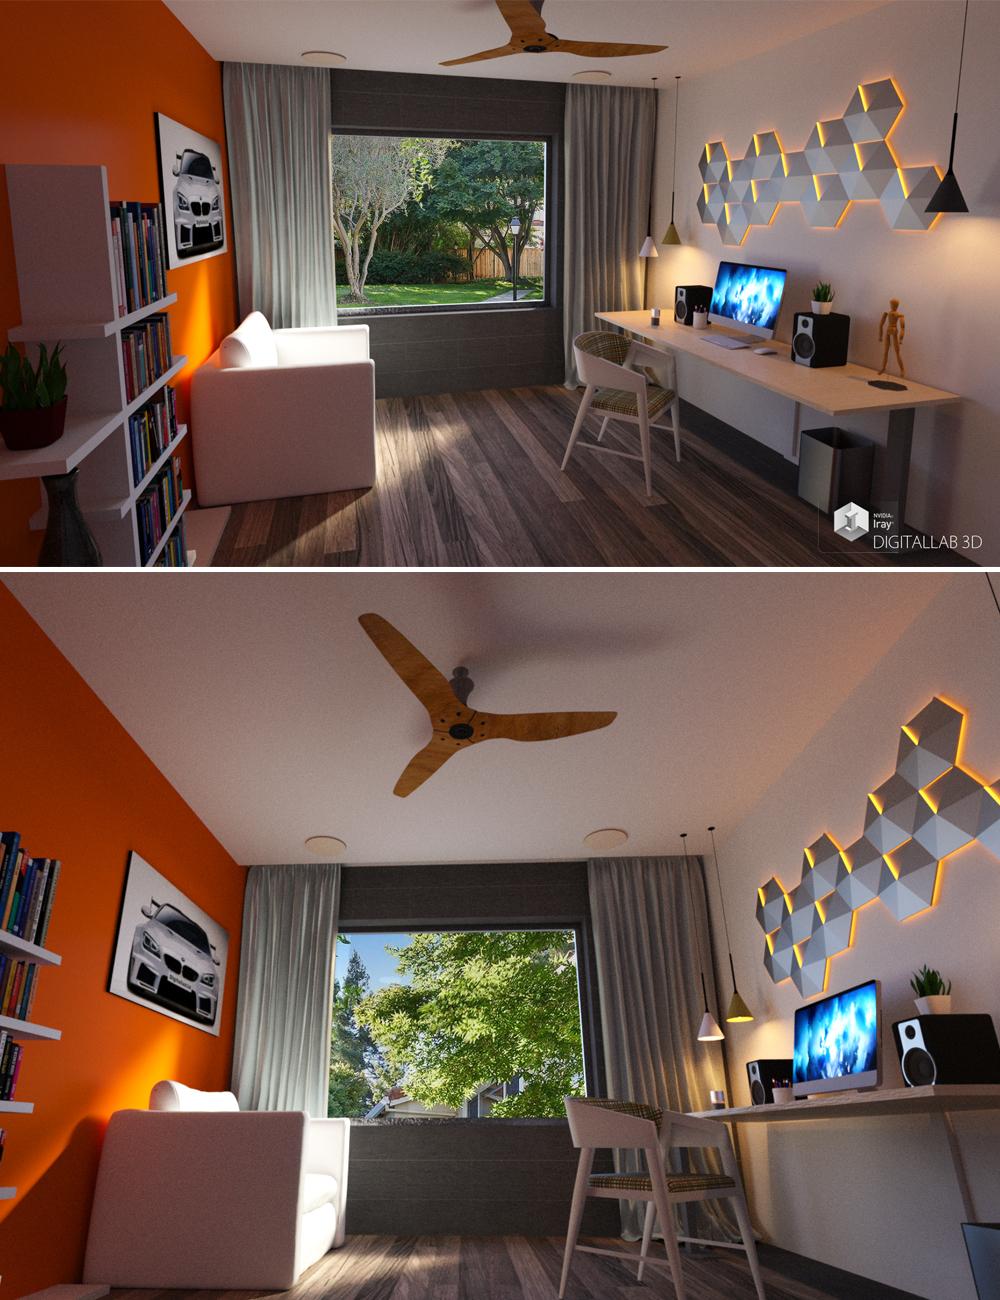 Home Office by: Digitallab3D, 3D Models by Daz 3D